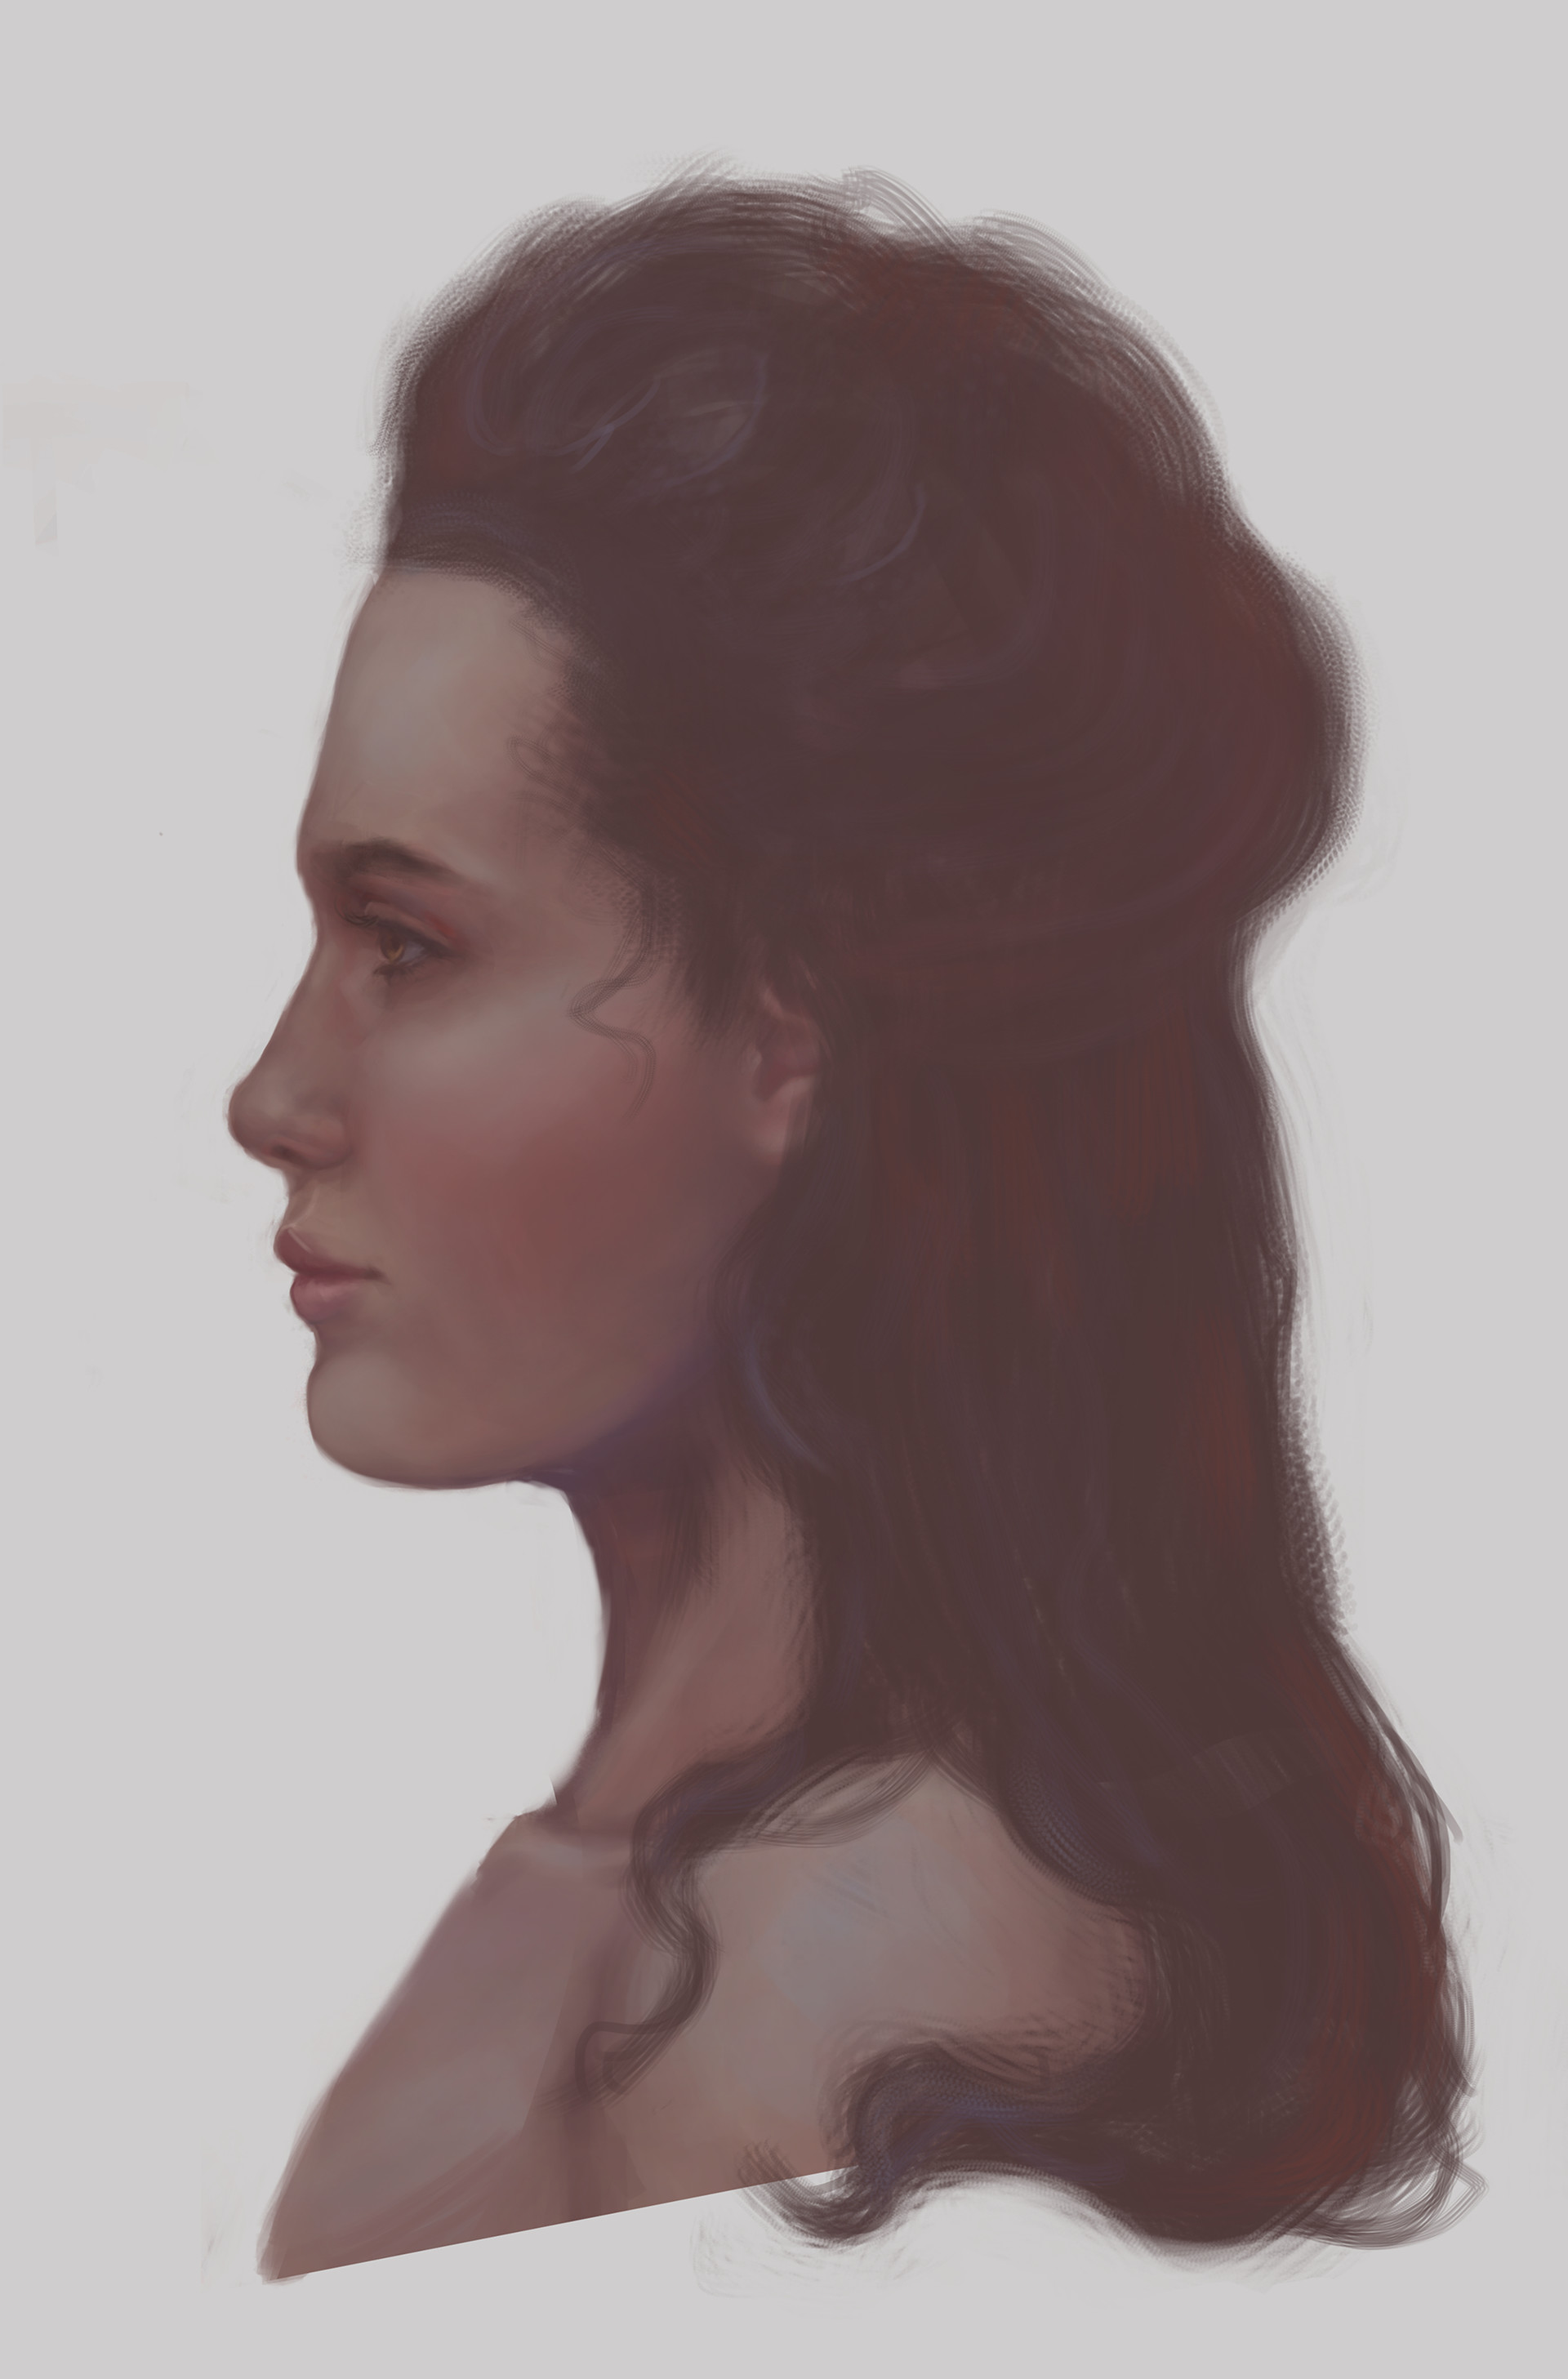 Maya grishanowitch marya 3